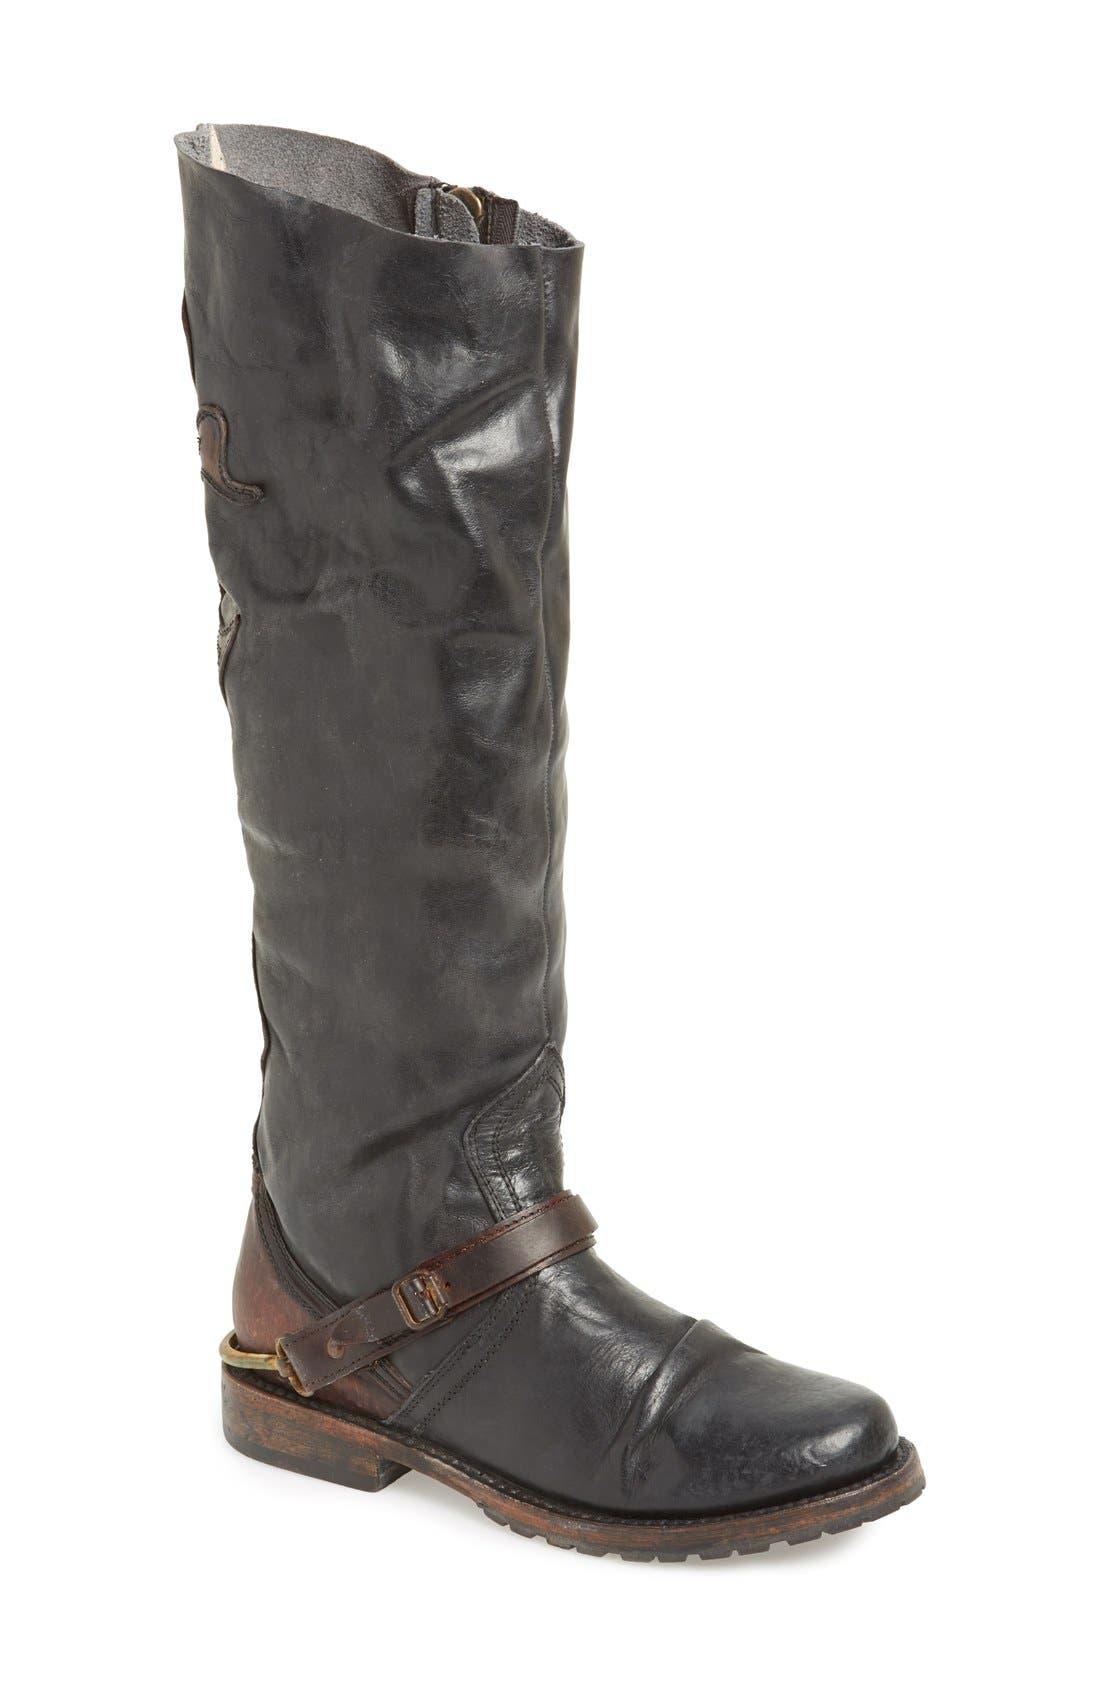 Main Image - Freebird by Steven 'Lyon' Leather Riding Boot (Women)